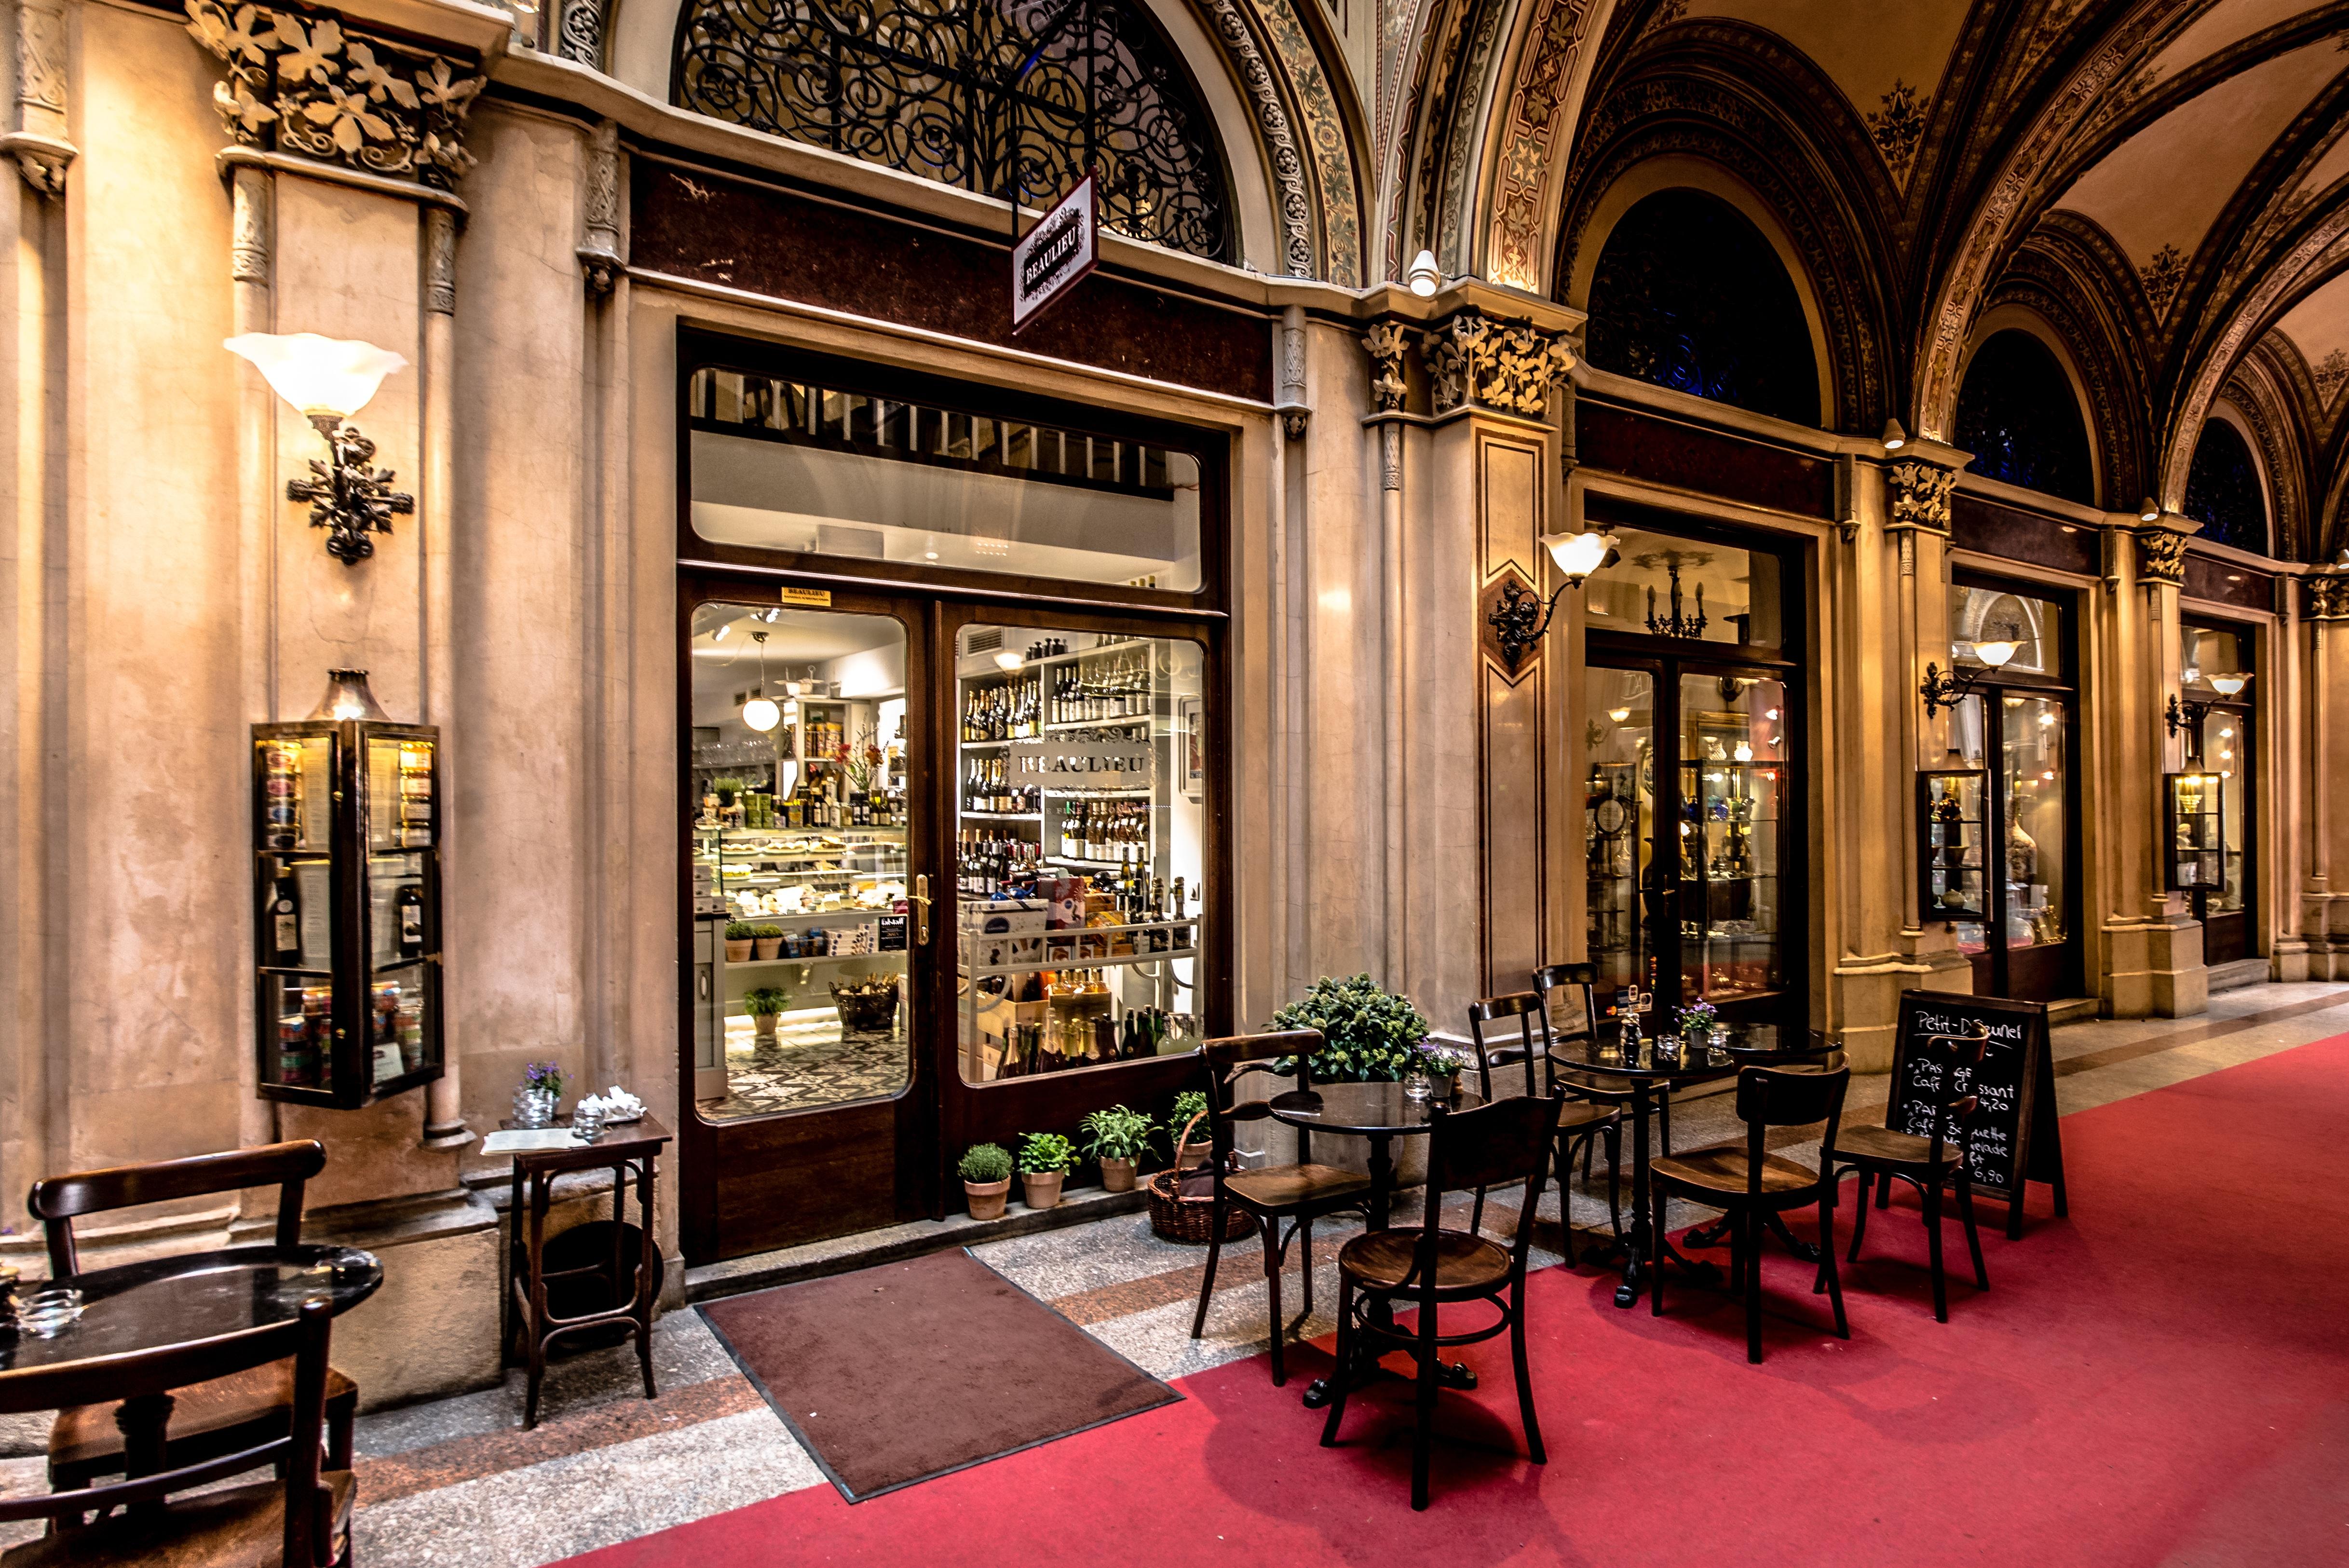 Free Images : cafe, coffee, building, restaurant, bar, interior ...